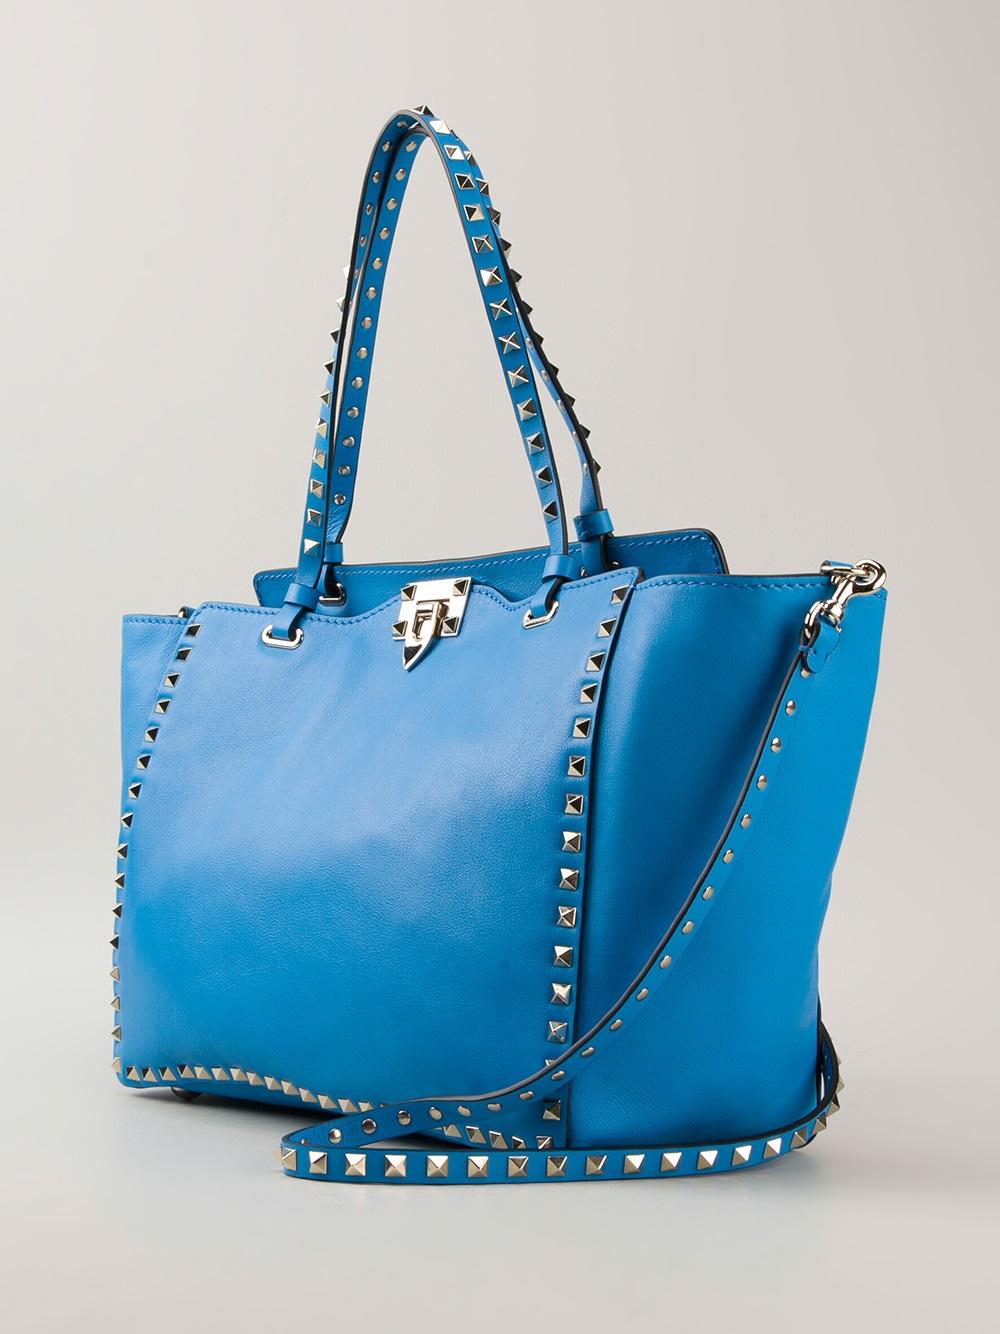 Valentino Rockstud Tote Bag In Blue